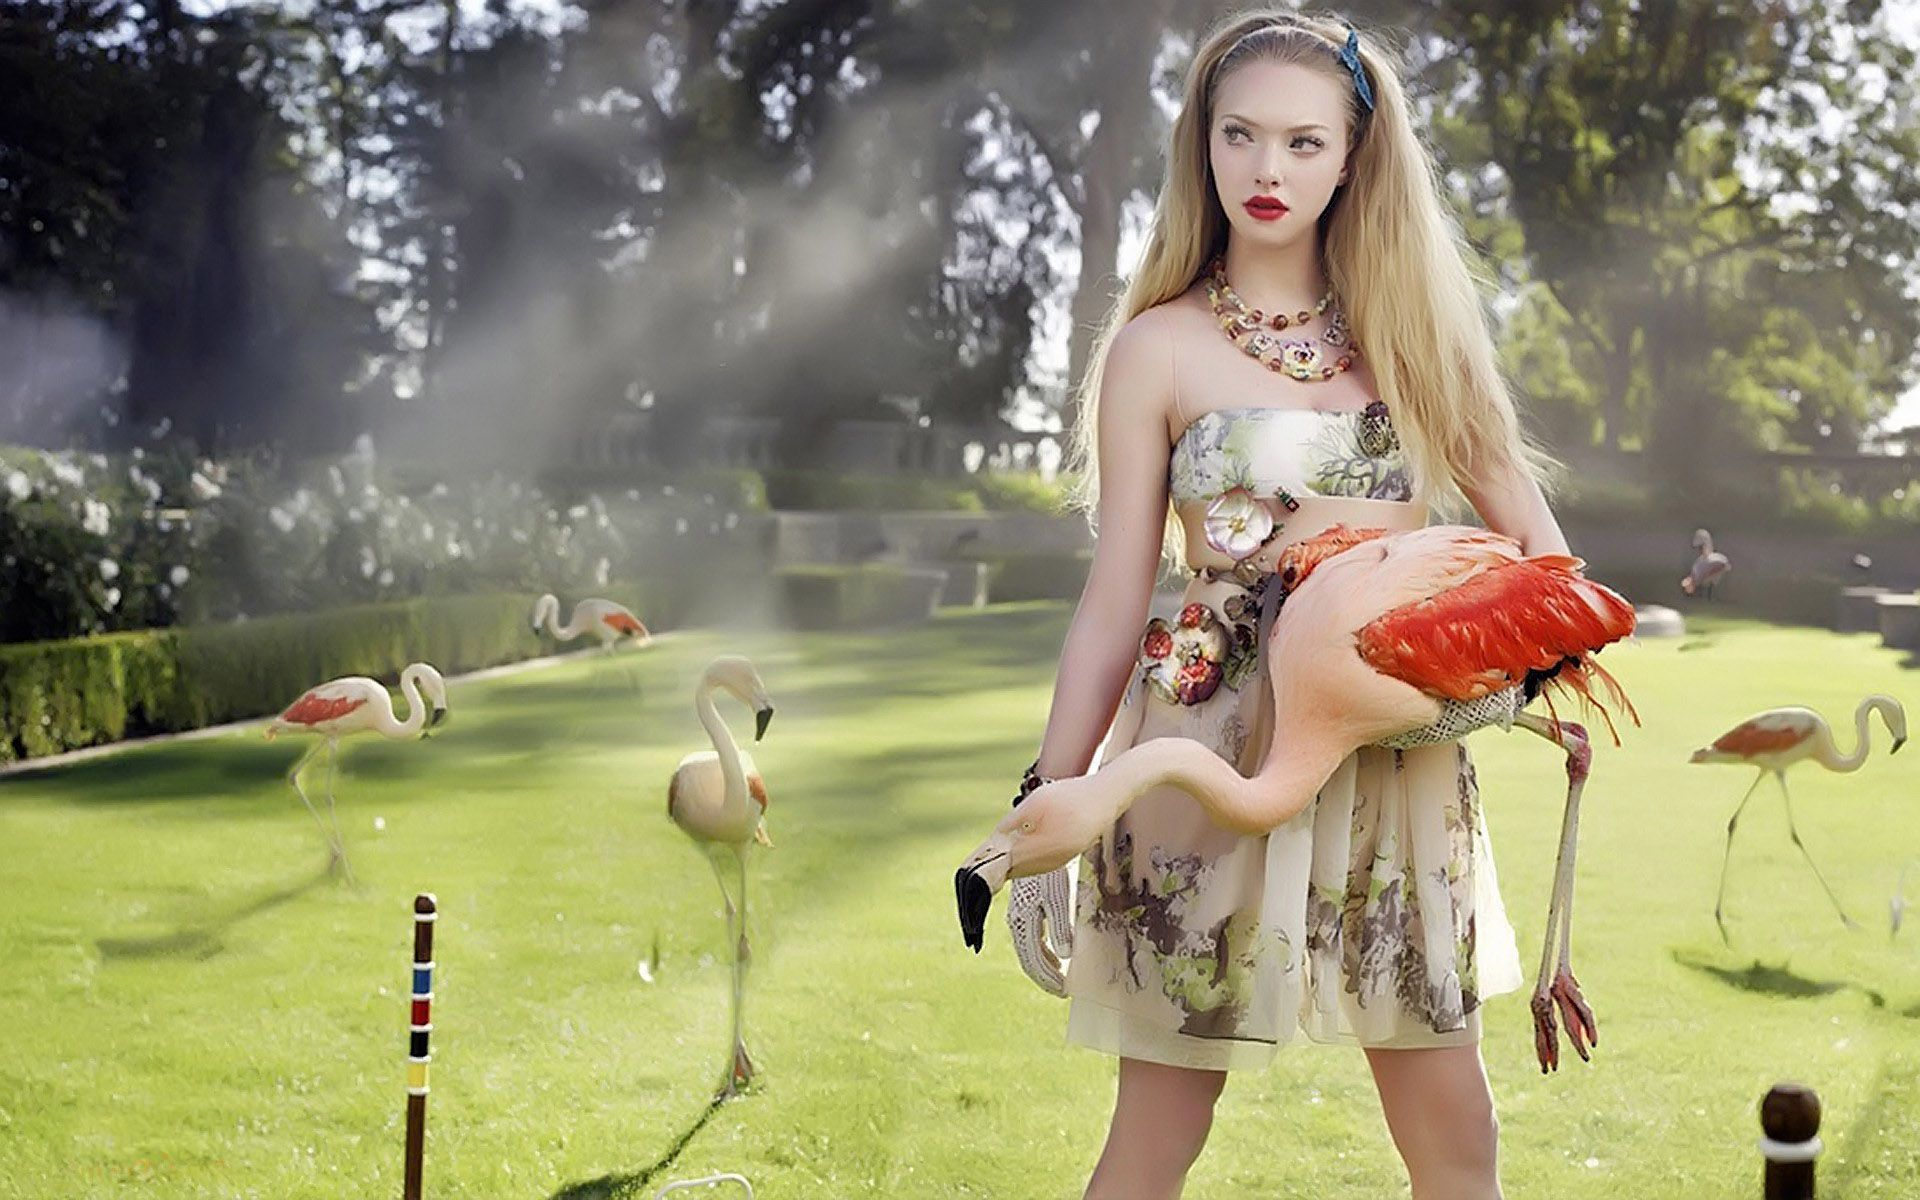 Pin by Jessica Khor on Alice | Amanda seyfried, Amanda, Gorgeous women